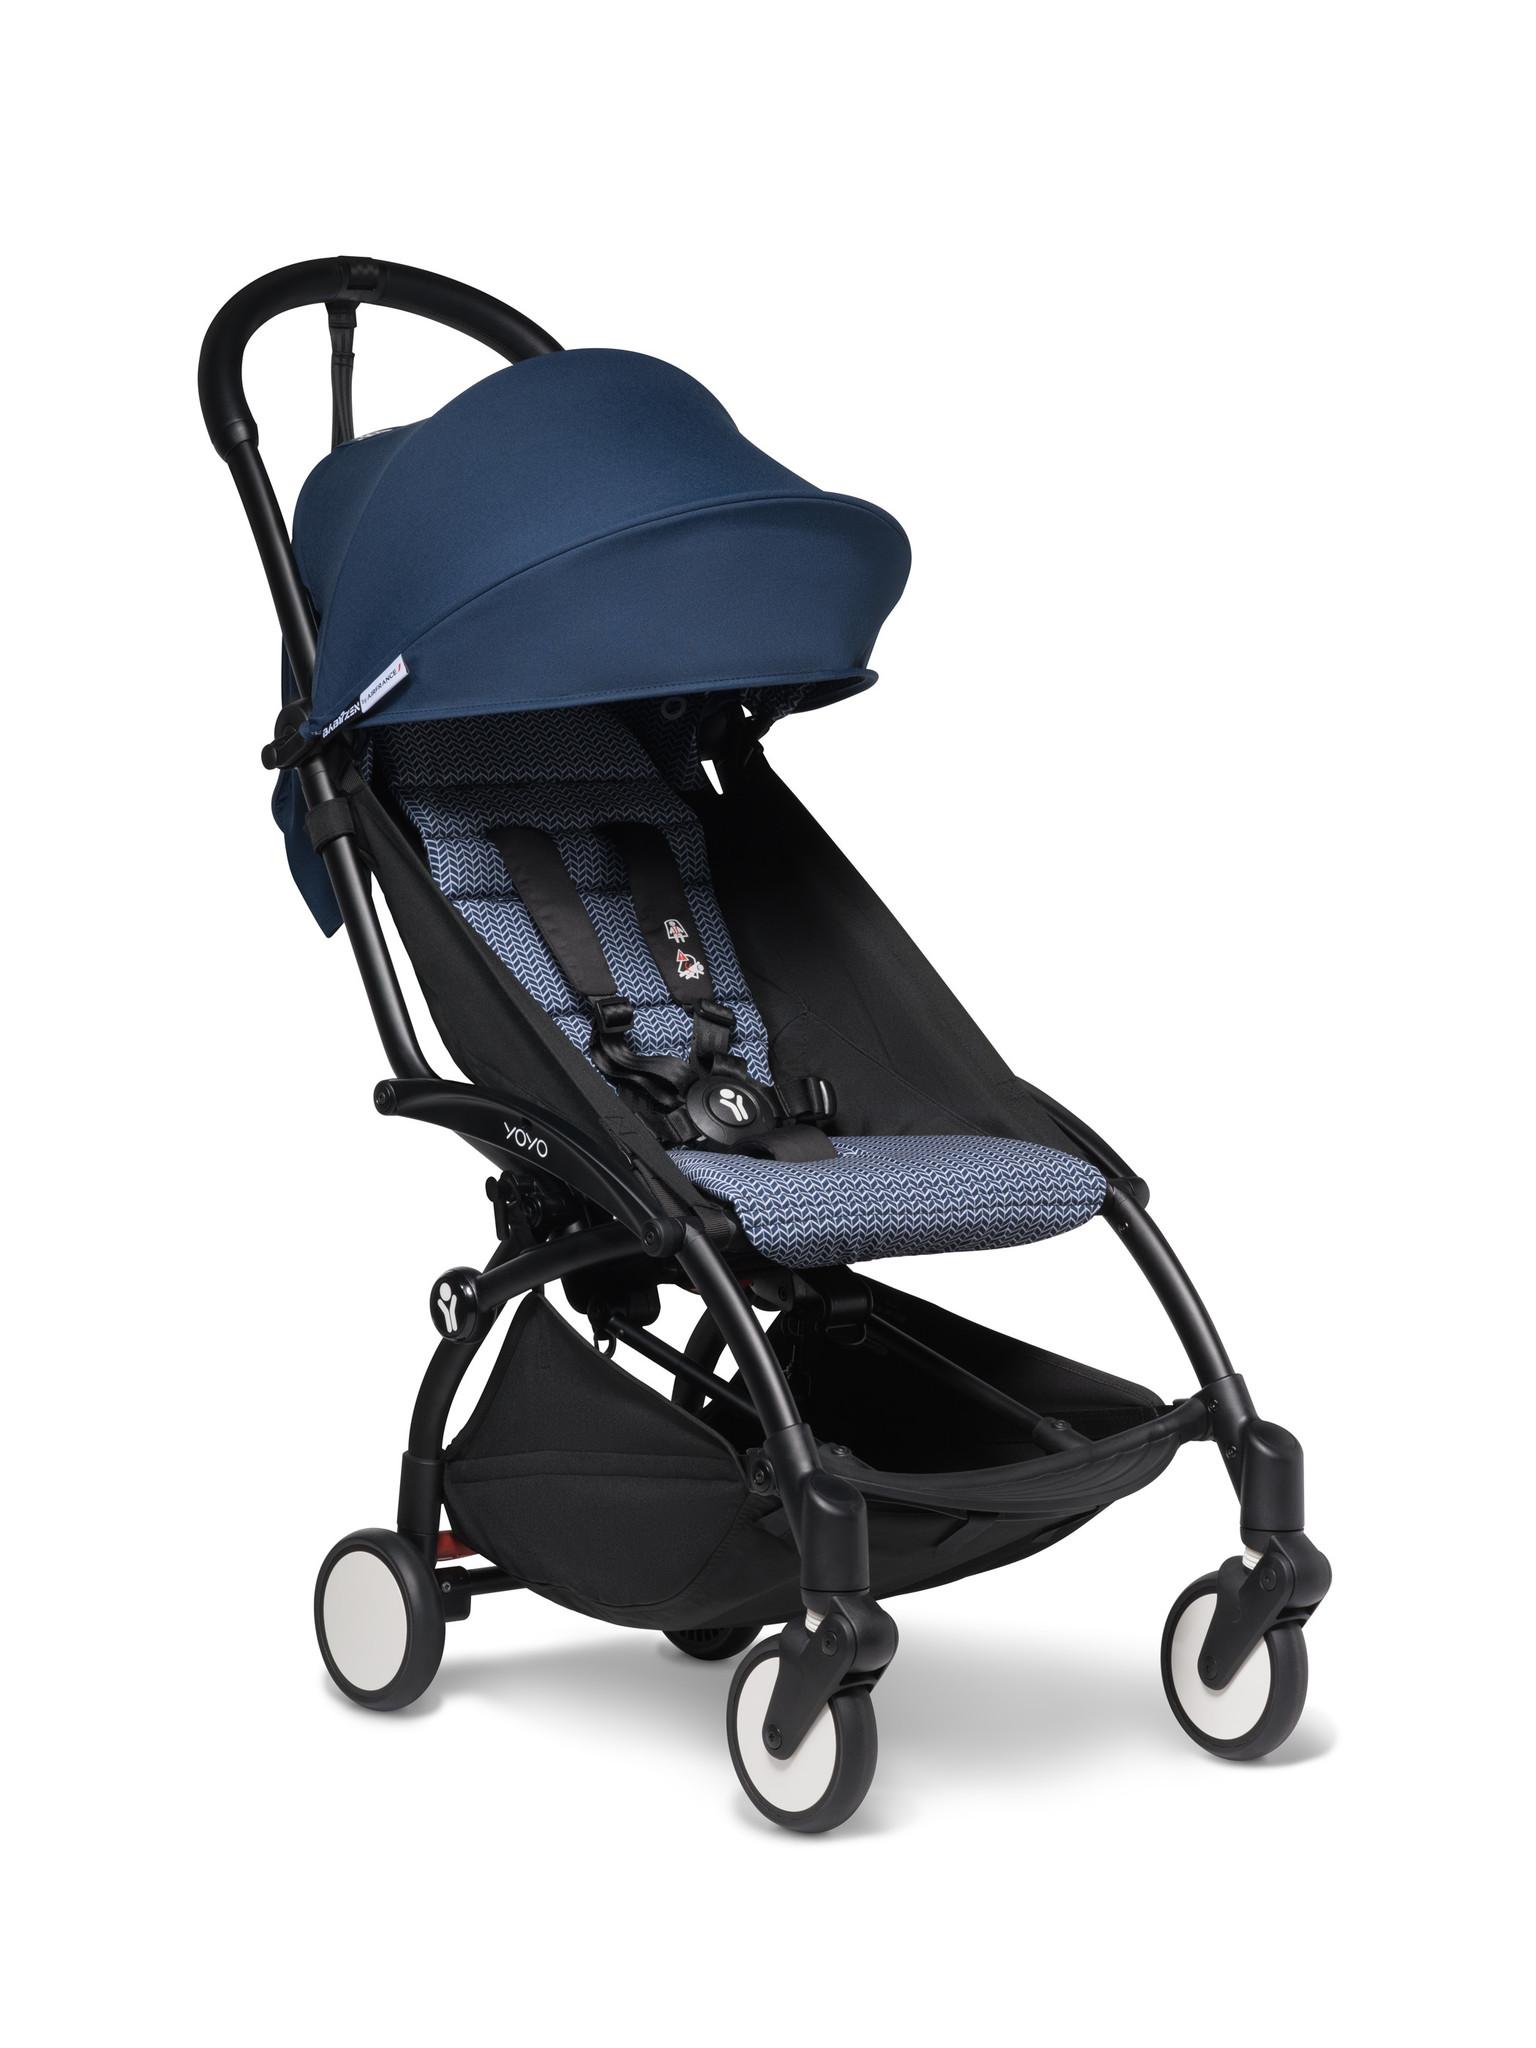 Babyzen Babyzen YOYO² buggy COMPLEET / FULL SET 0+ and 6+ navy AirFrance frame zwart incl. YOYO² BeSafe autostoel zwart